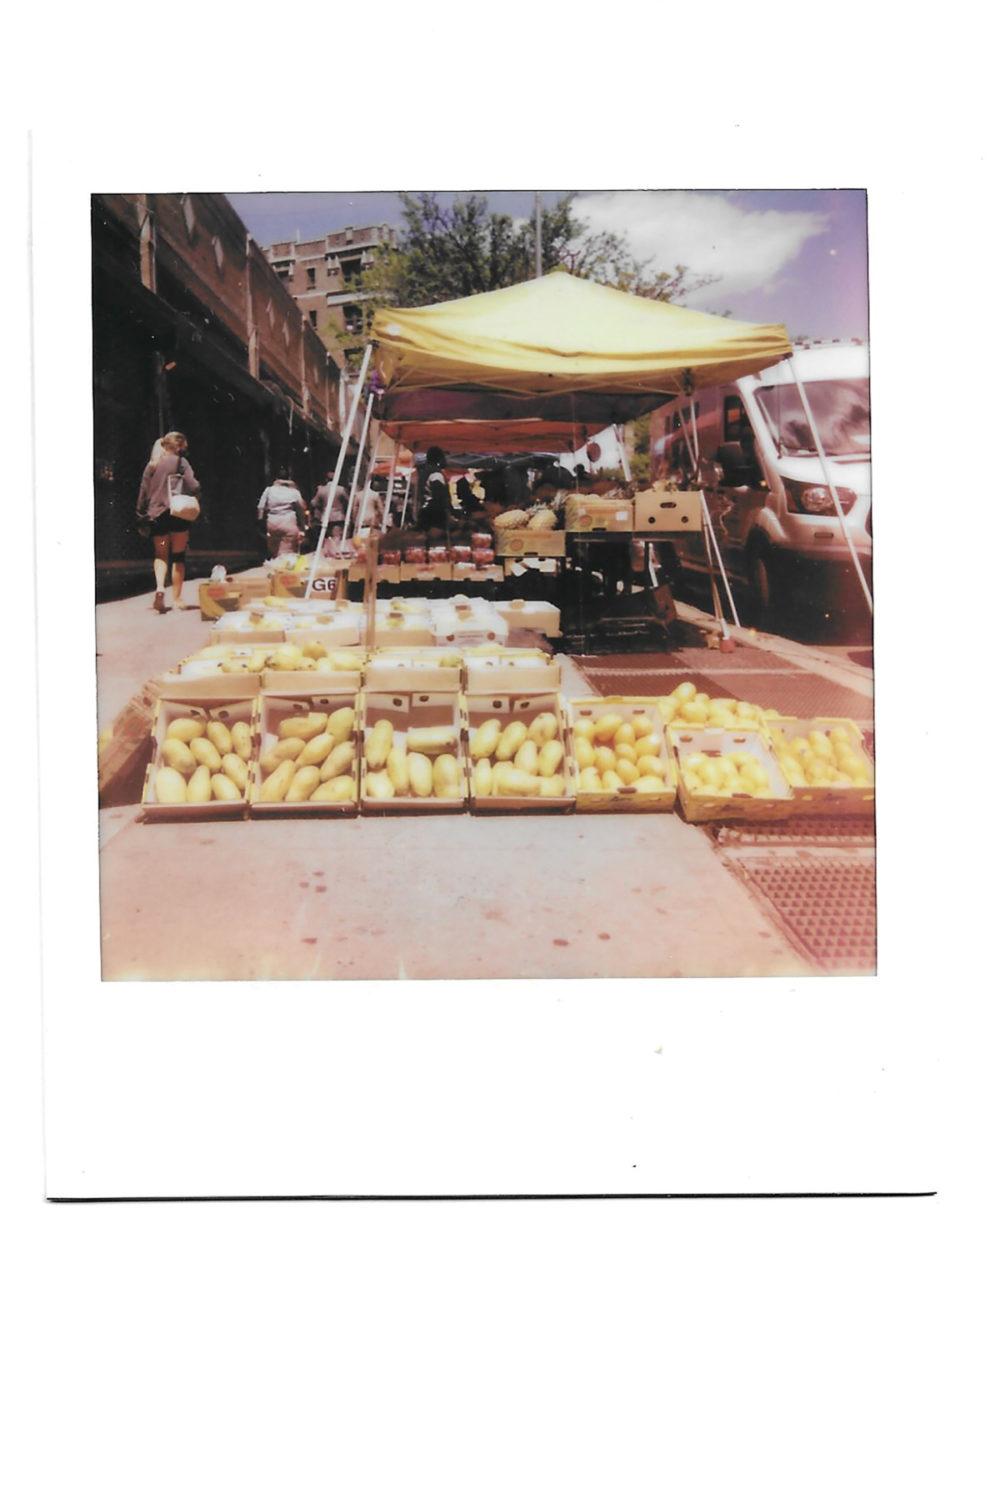 Fruit stand on corner in New York City